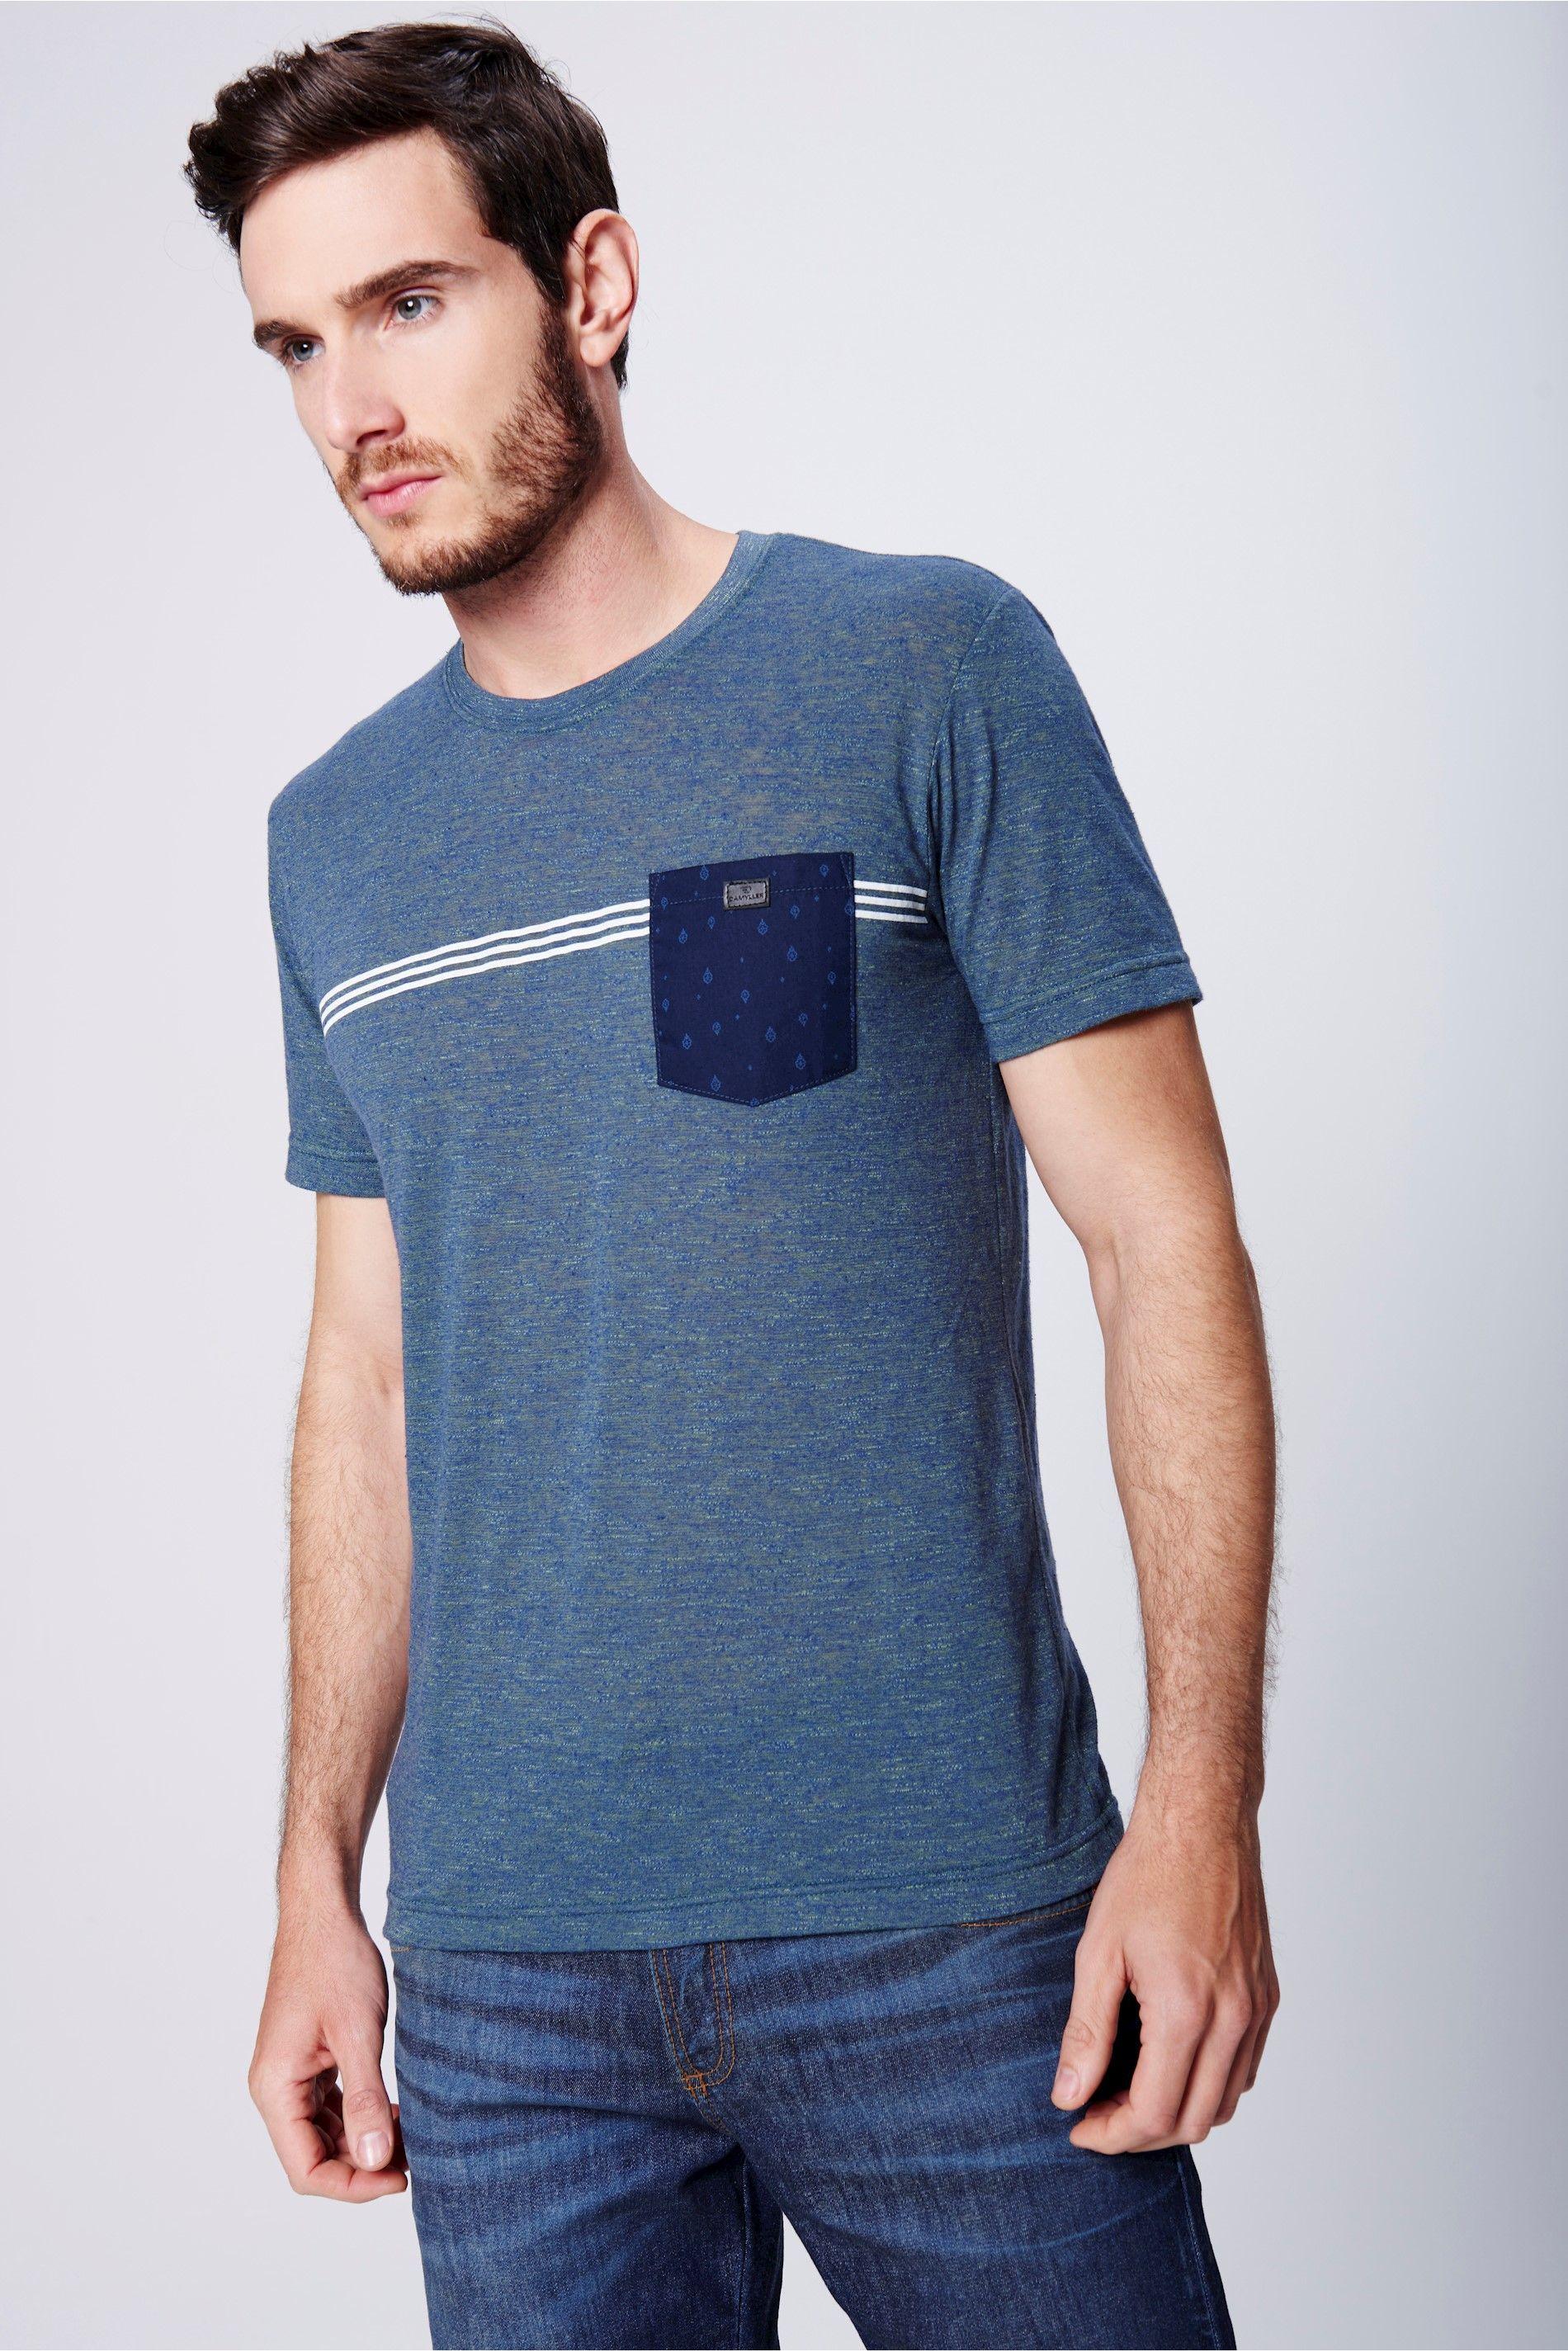 9ae87b6005 Camiseta Fit com Bolso Frontal Masculina - Damyller-smartphone ...